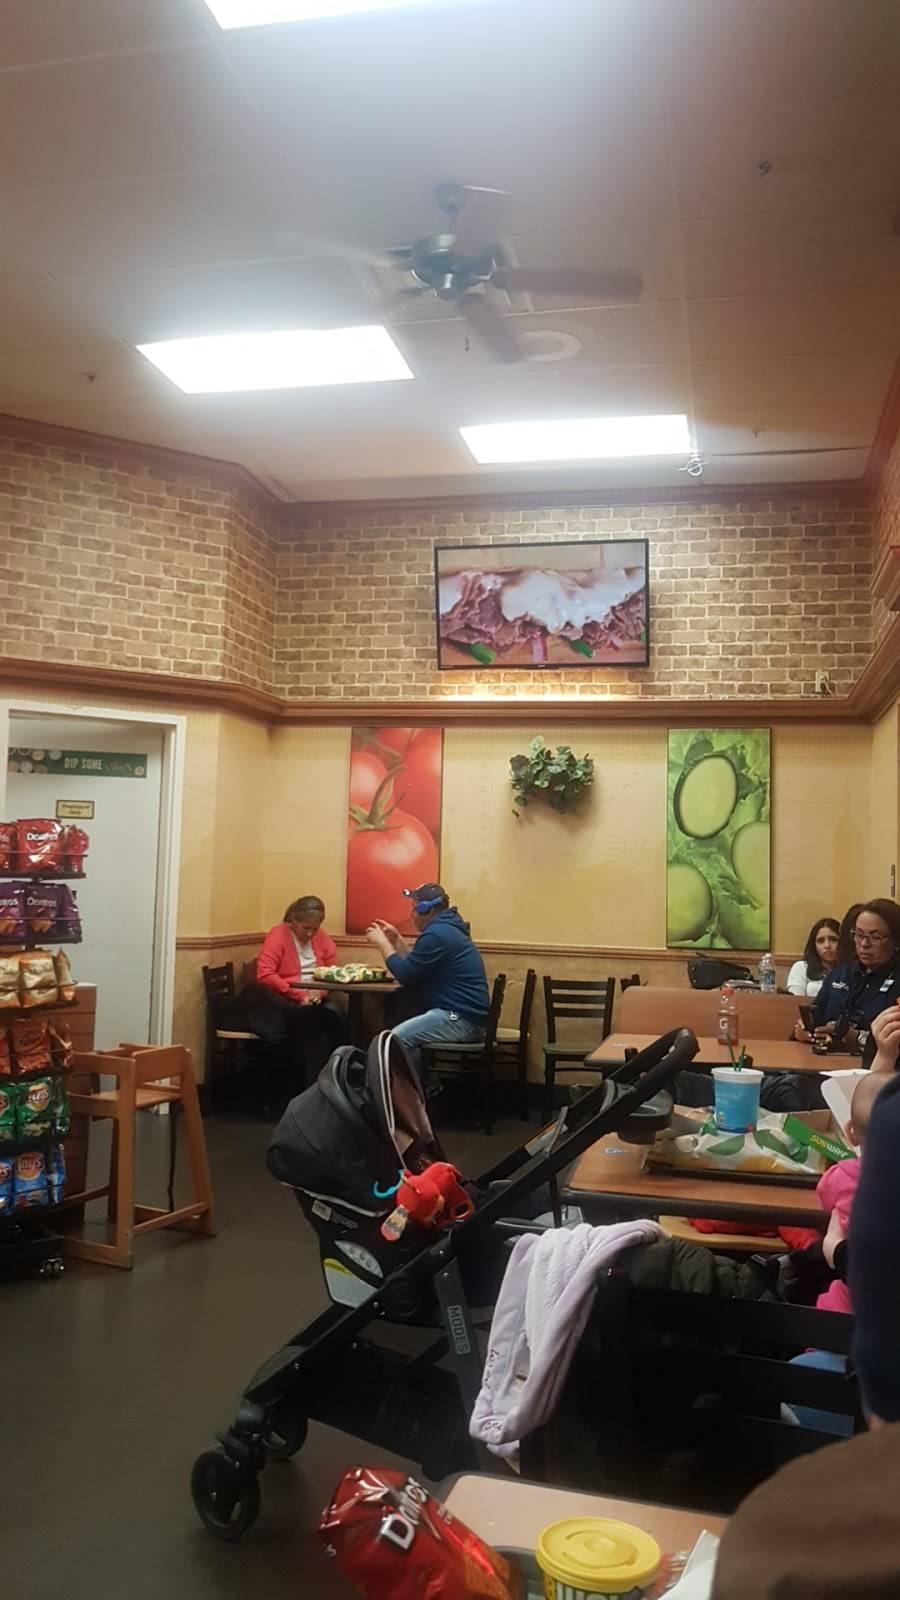 Subway Restaurants   restaurant   2100 88th, North Bergen, NJ 07047, USA   2017581802 OR +1 201-758-1802